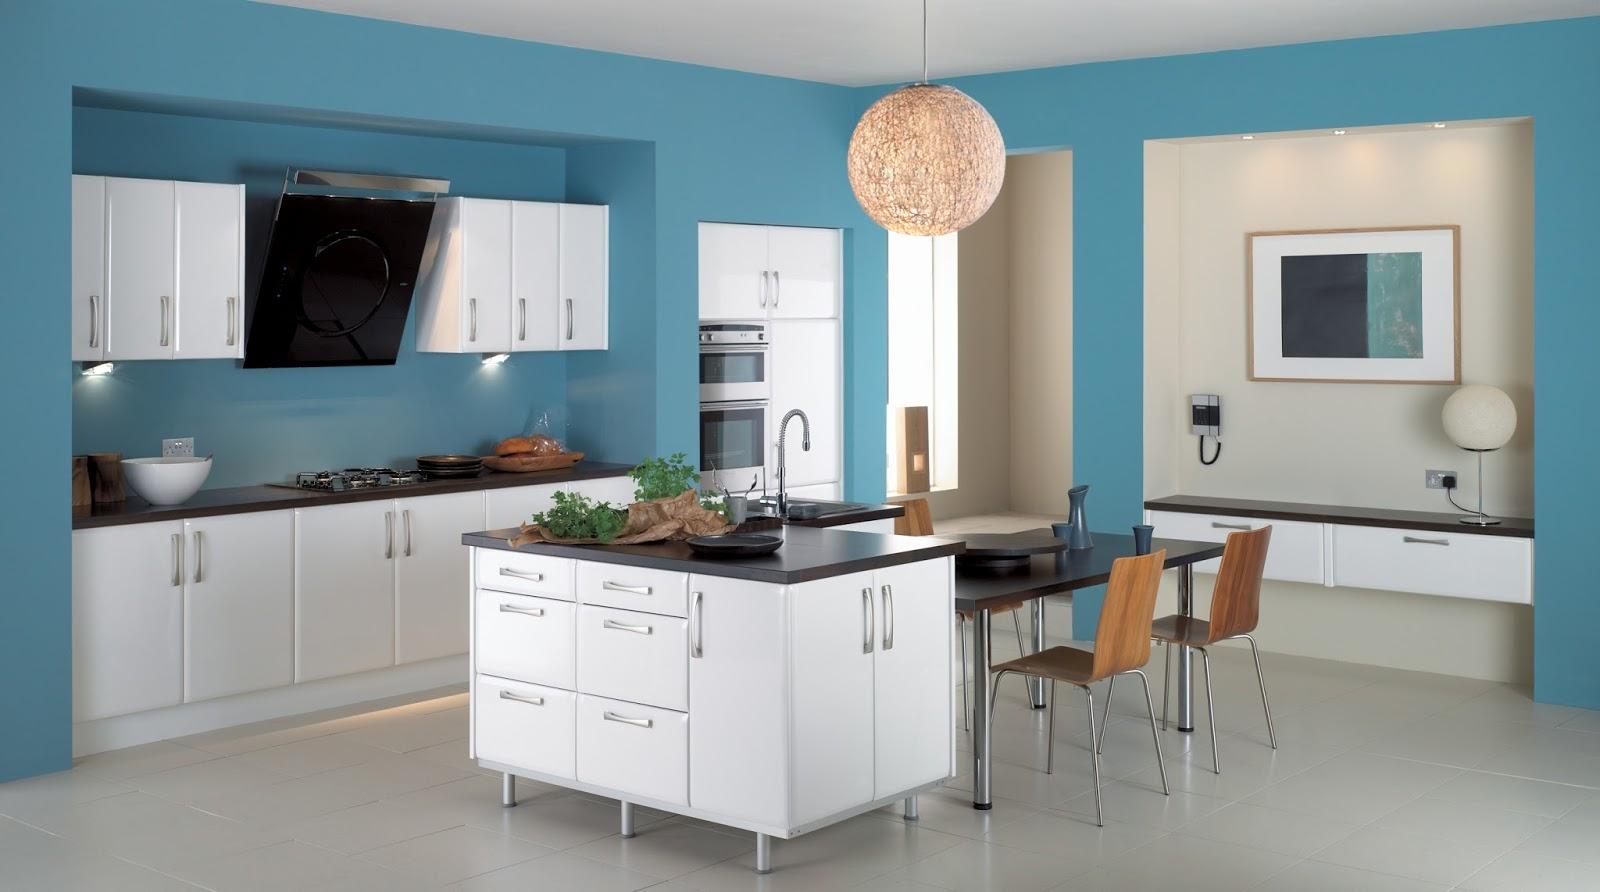 Interior House Painting Online Cost Estimator